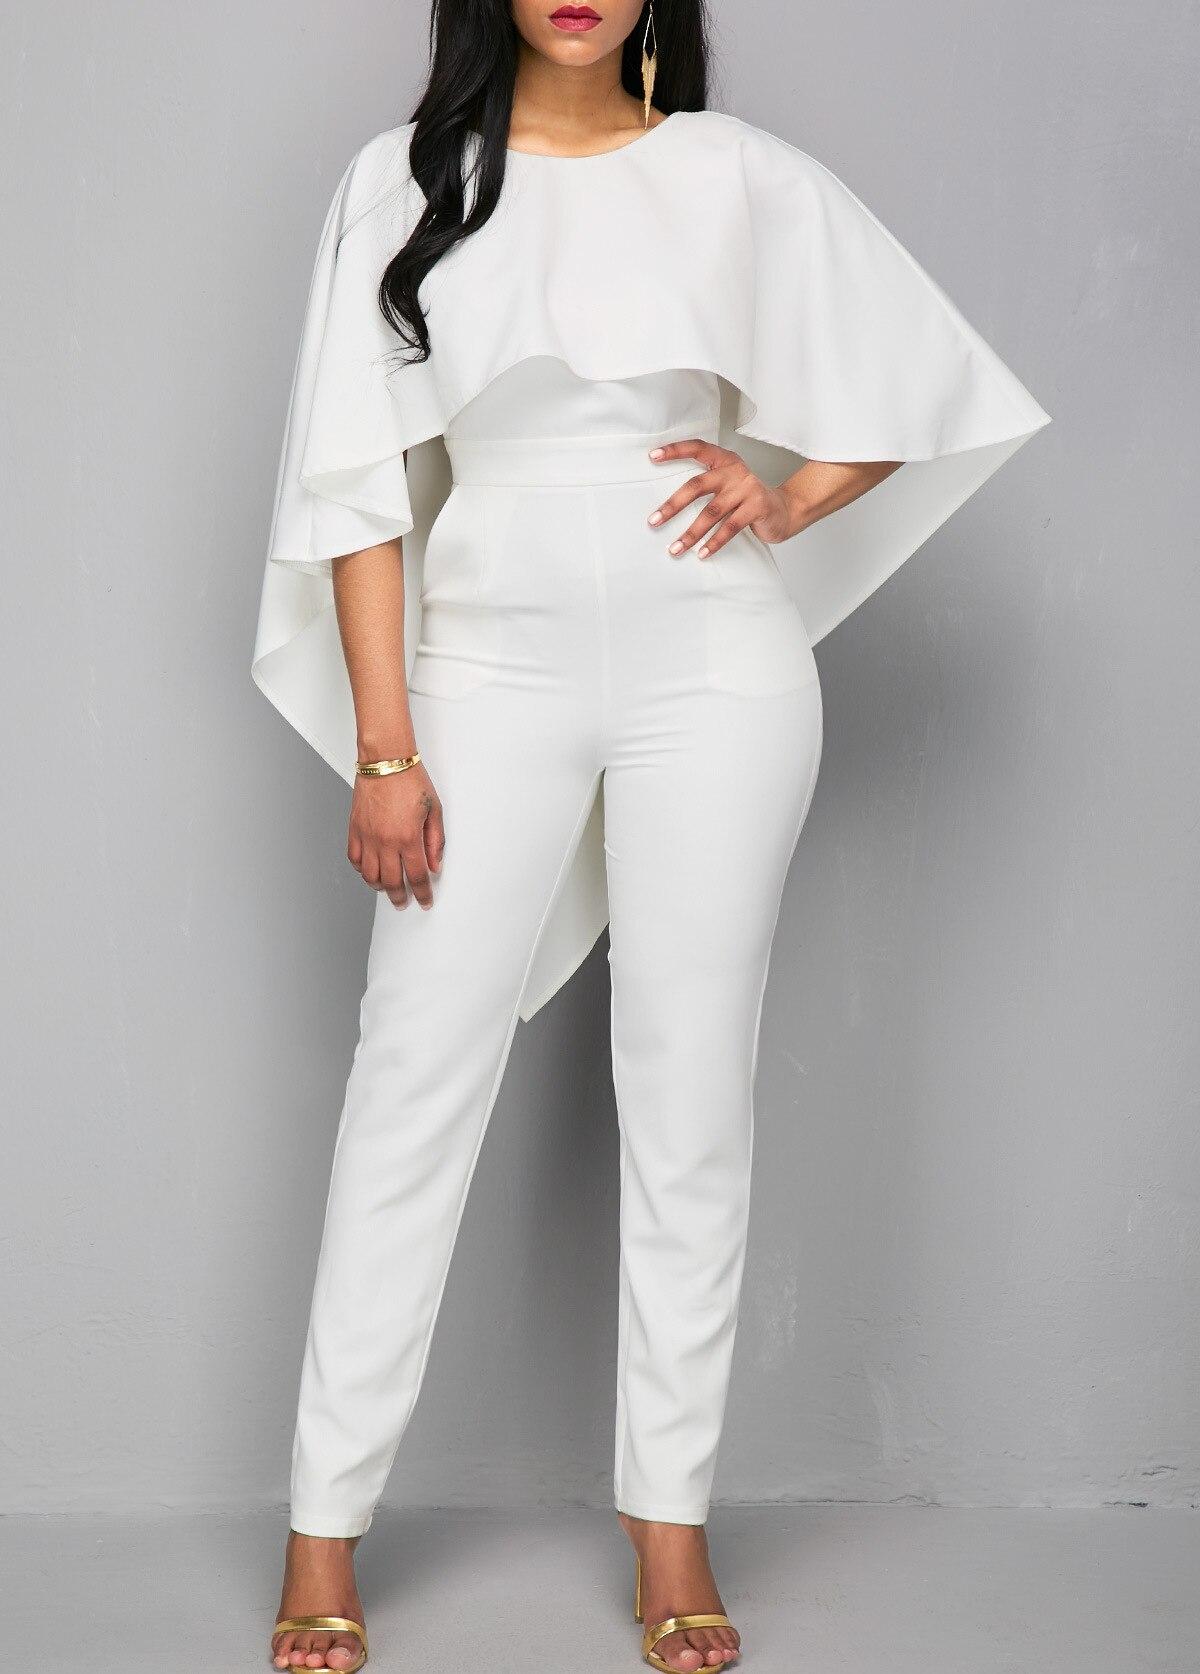 08f630c0cd5b8 Amazon Ladies White Jumpsuits - raveitsafe